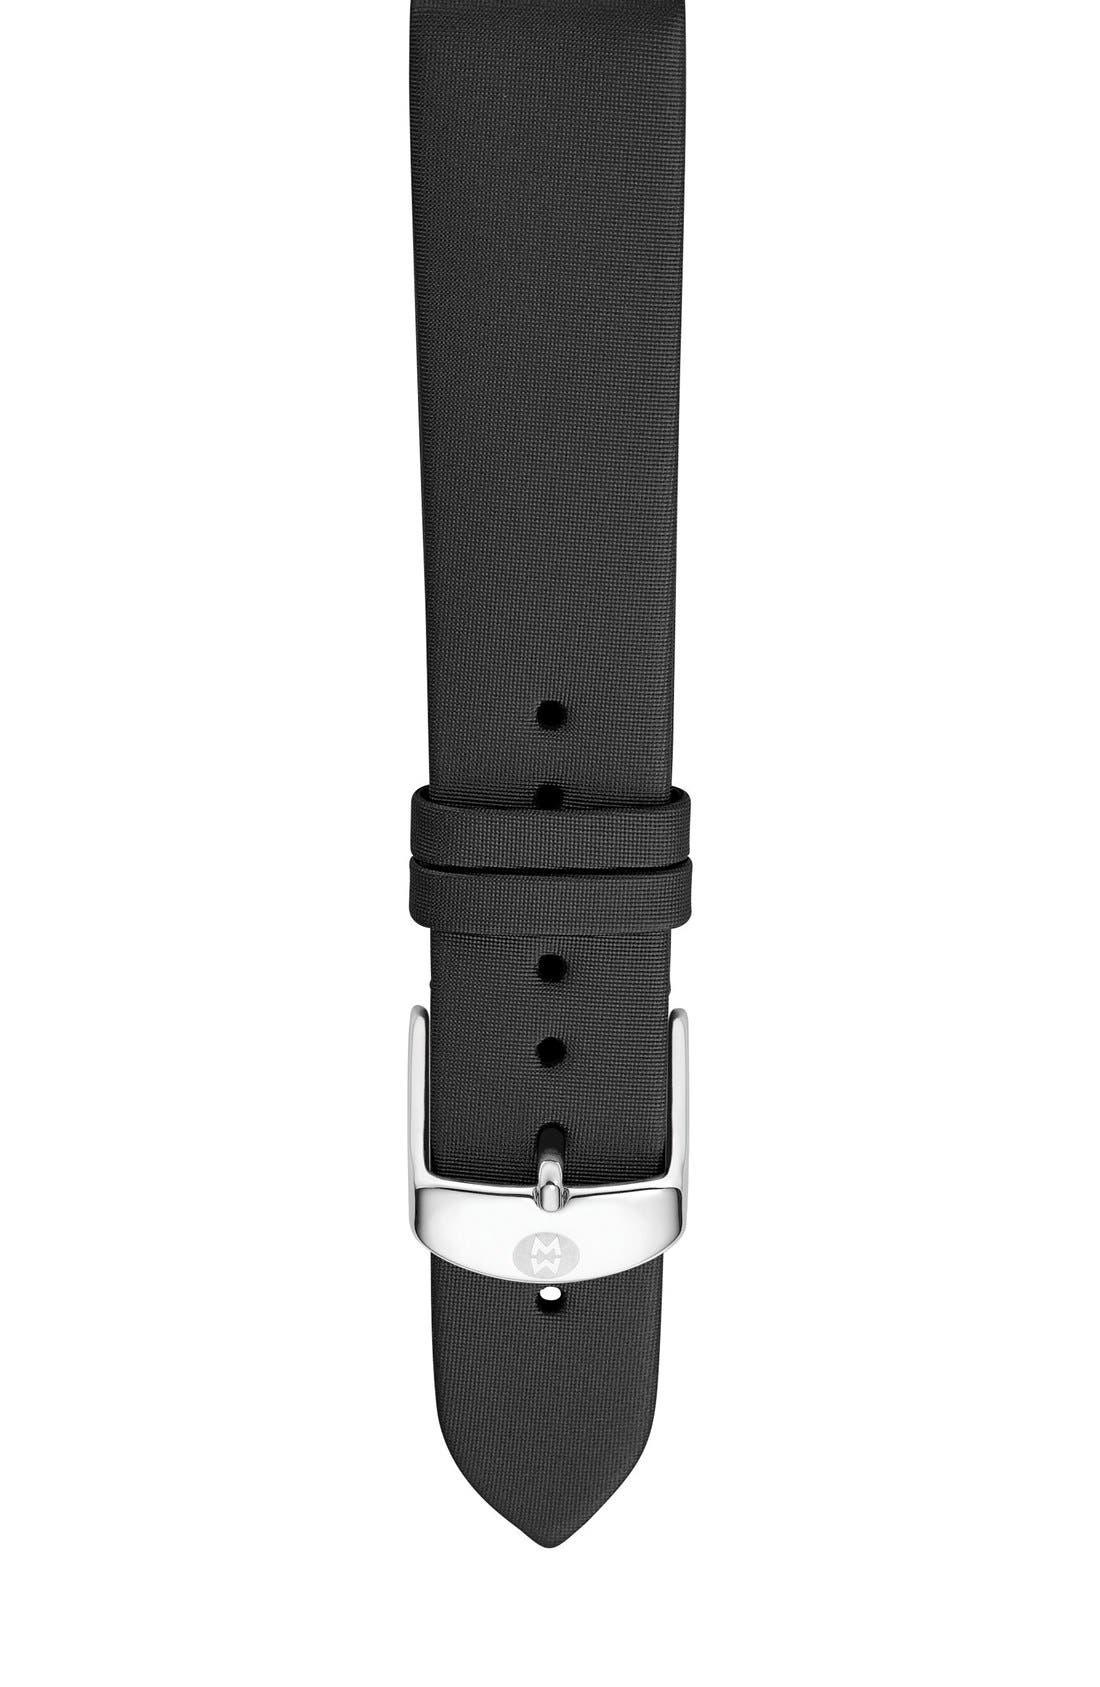 16mm Satin Watch Strap,                             Main thumbnail 1, color,                             Black